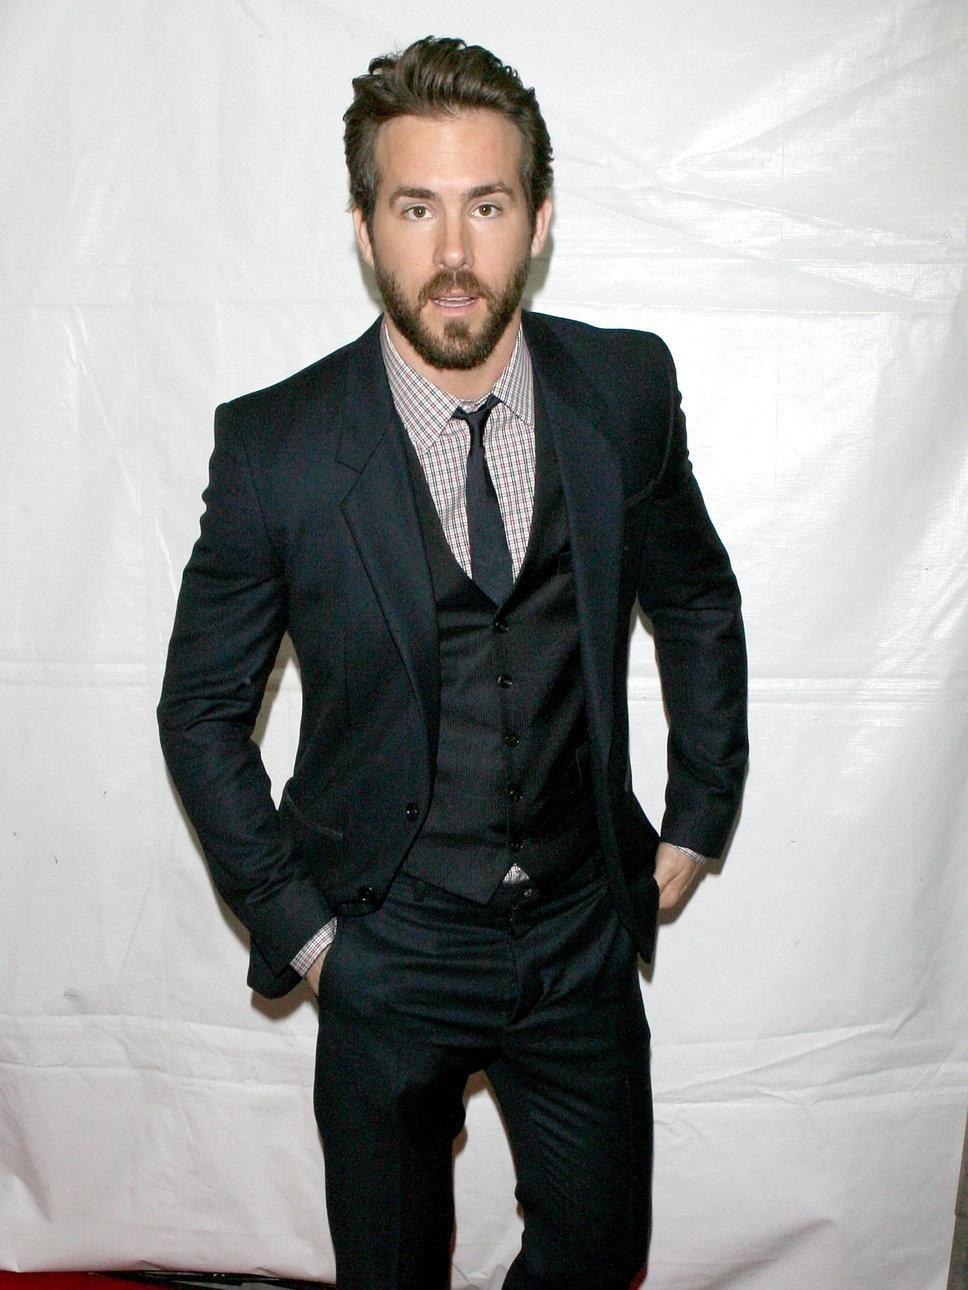 Ryan Reynolds Ryan Reynolds Style, Beard Suit, 3 Piece Suits, Three Piece  Suit 89897ff683